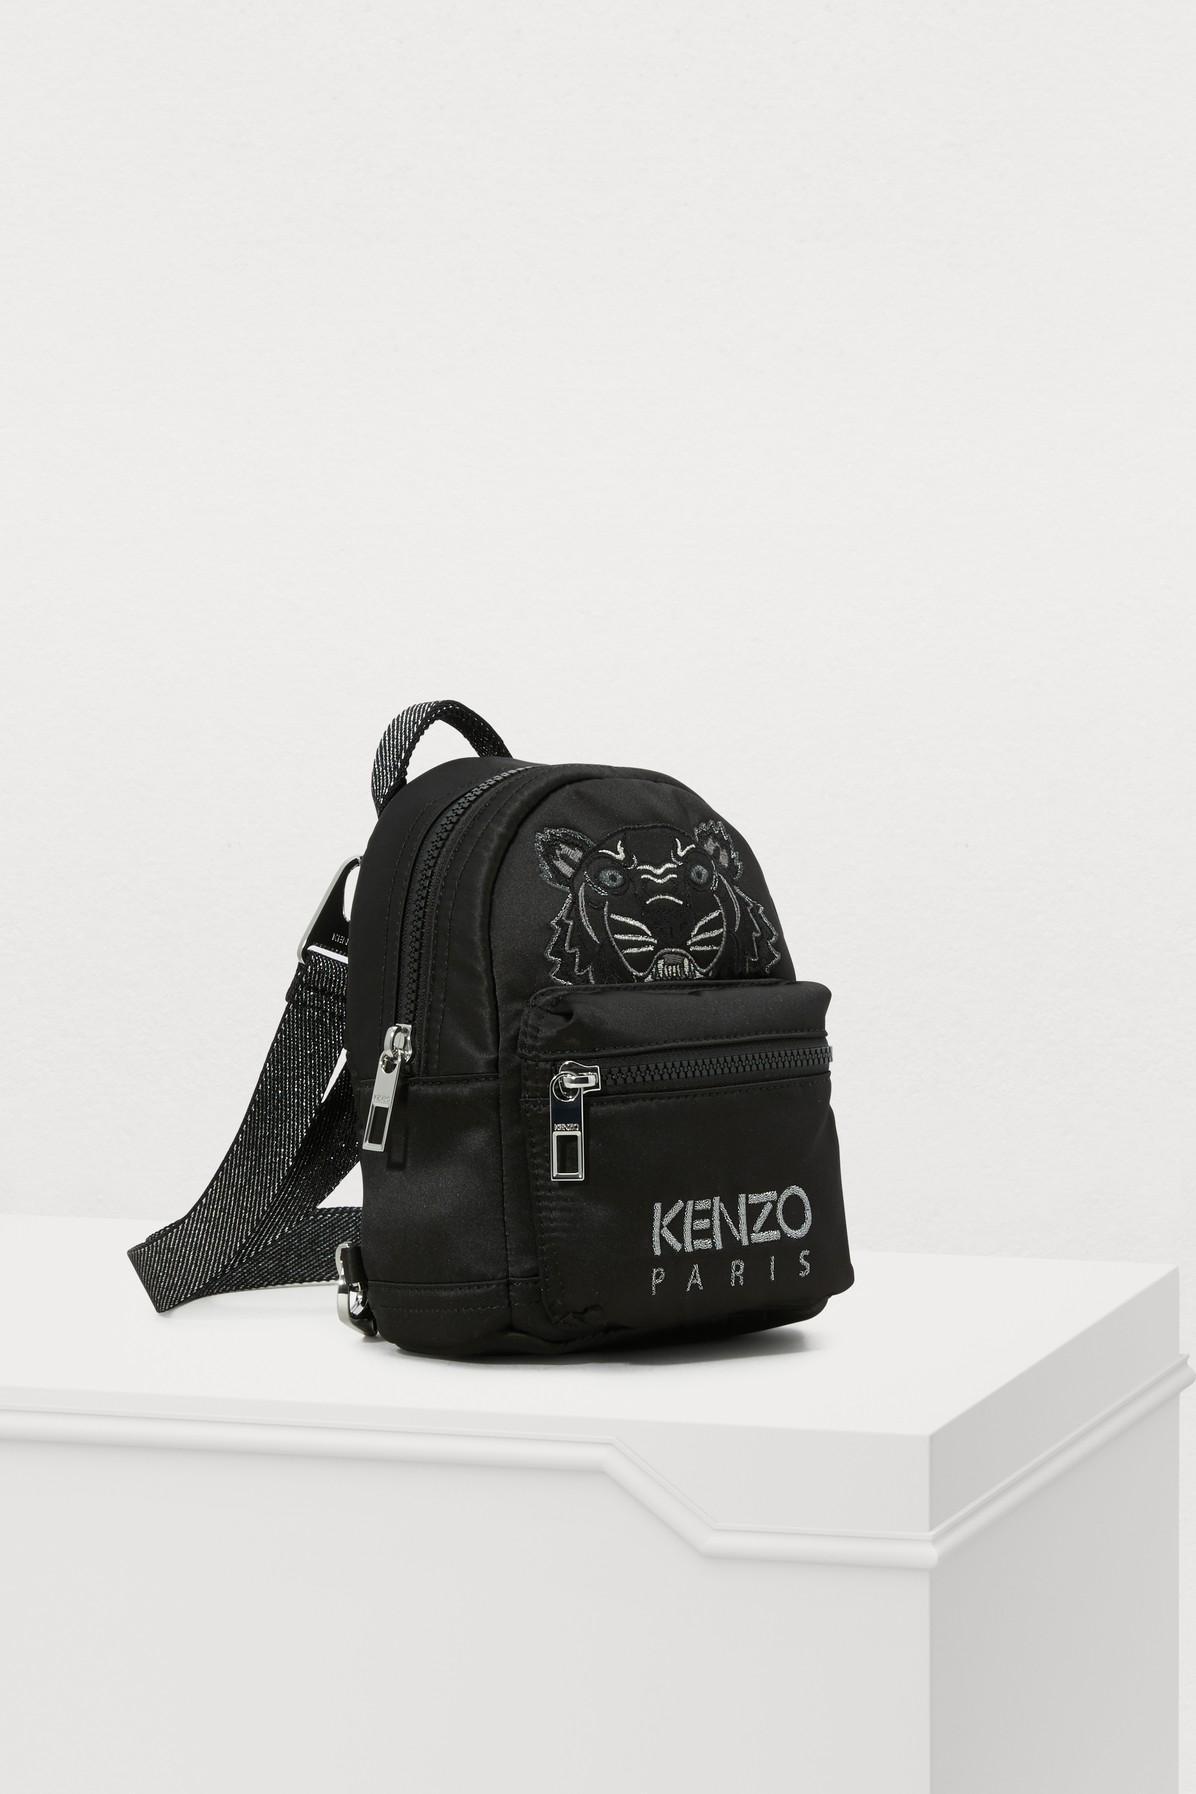 124a3423353 KENZO - Black Mini Satin Tiger Rucksack  holiday Capsule  - Lyst. View  fullscreen